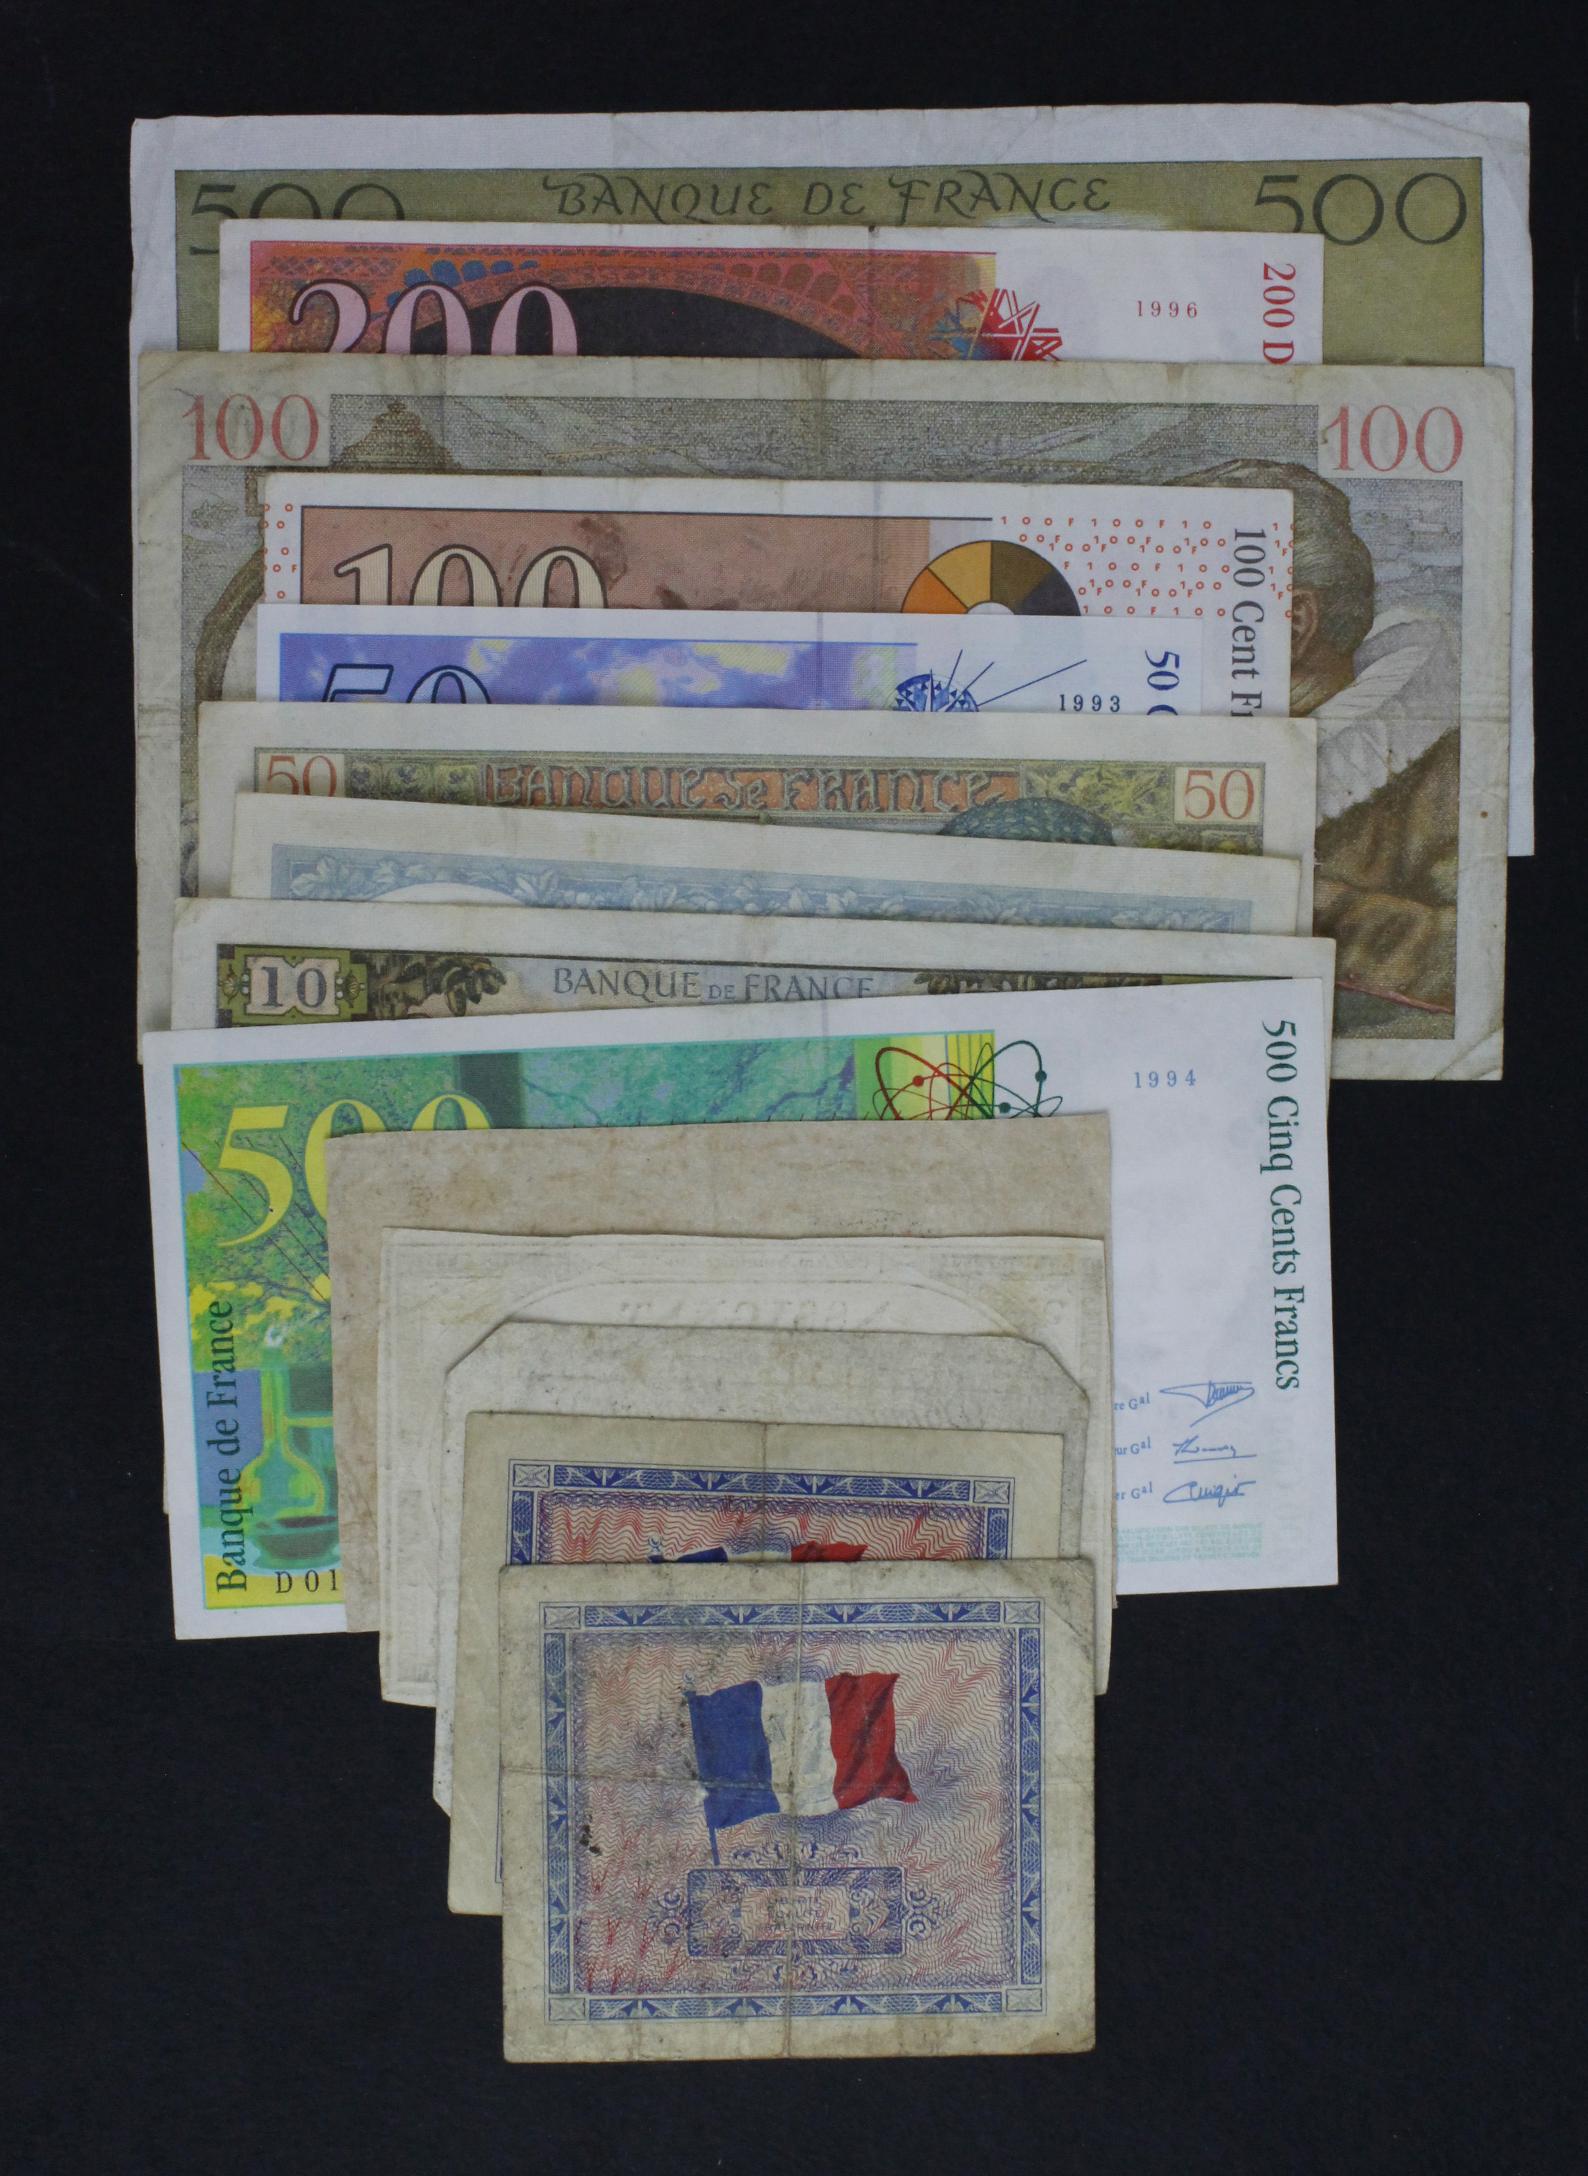 France (14), a small group including 3 x Assignats, 10 Francs and 50 Francs 1941, 500 Francs - Image 2 of 2